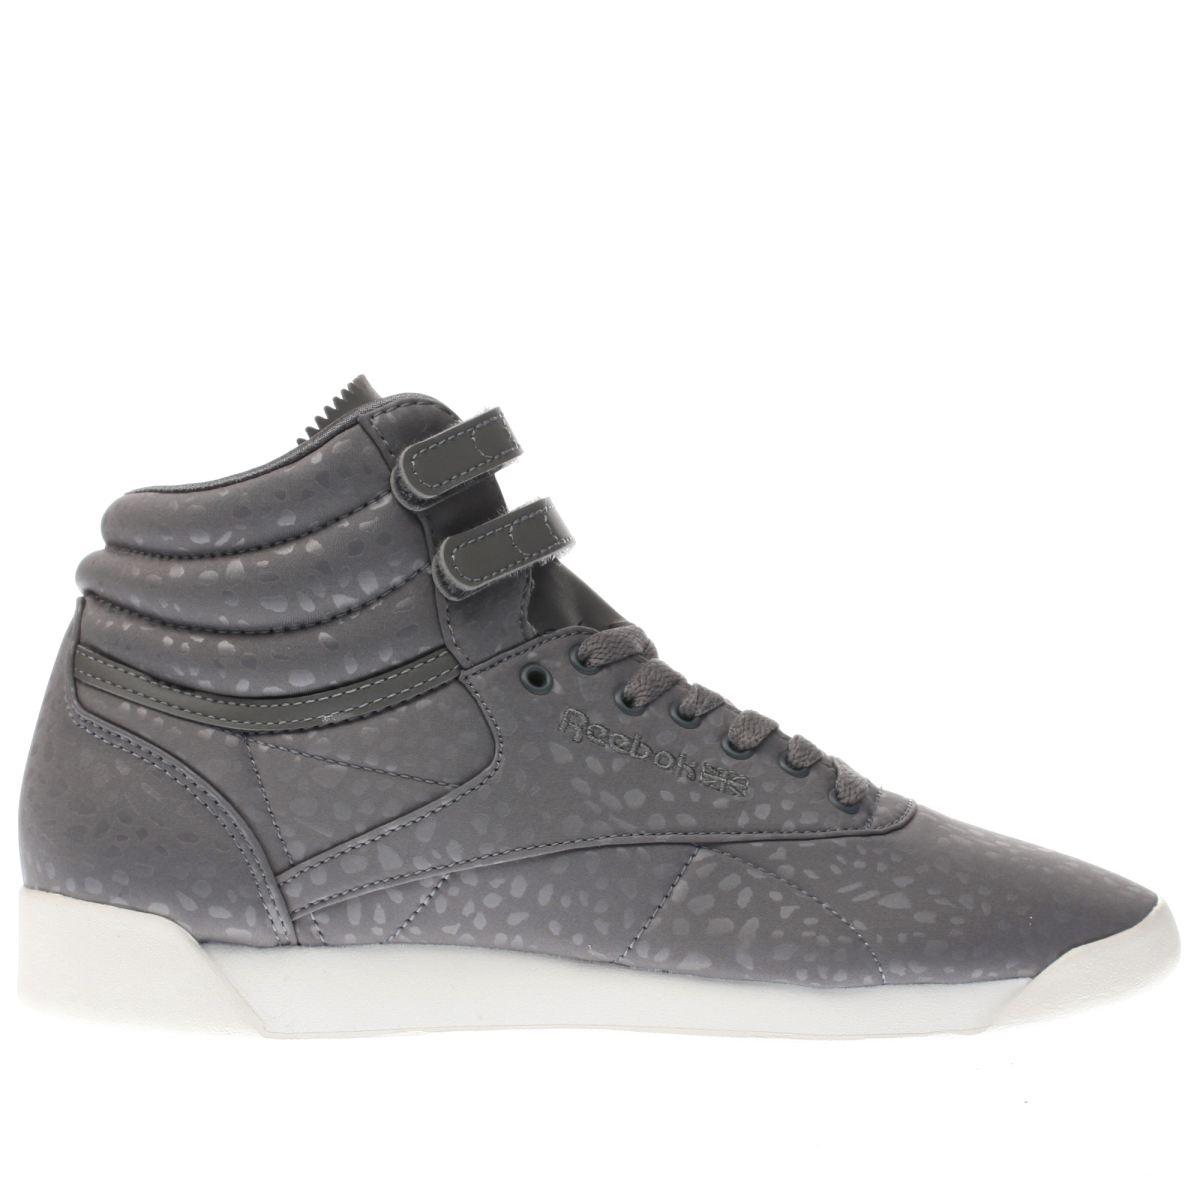 Reebok Reebok Dark Grey Freestyle Hi Lux Textile Trainers